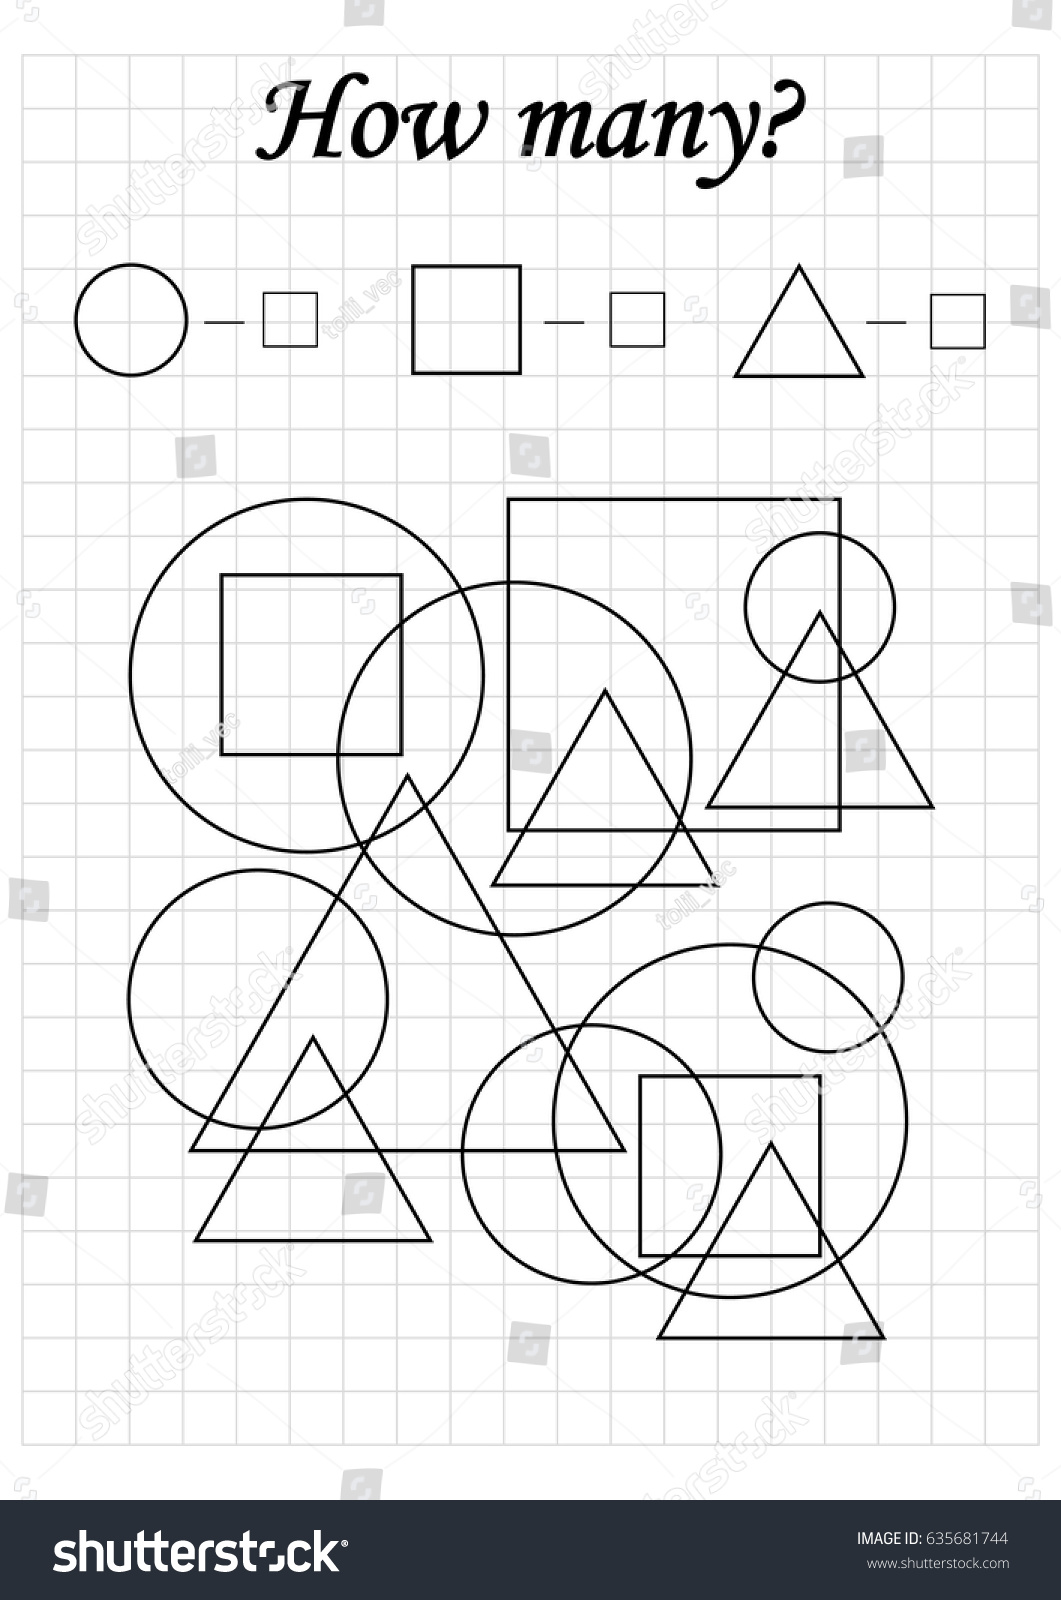 Mathematics Task How Many Objects Learning Stock Vector